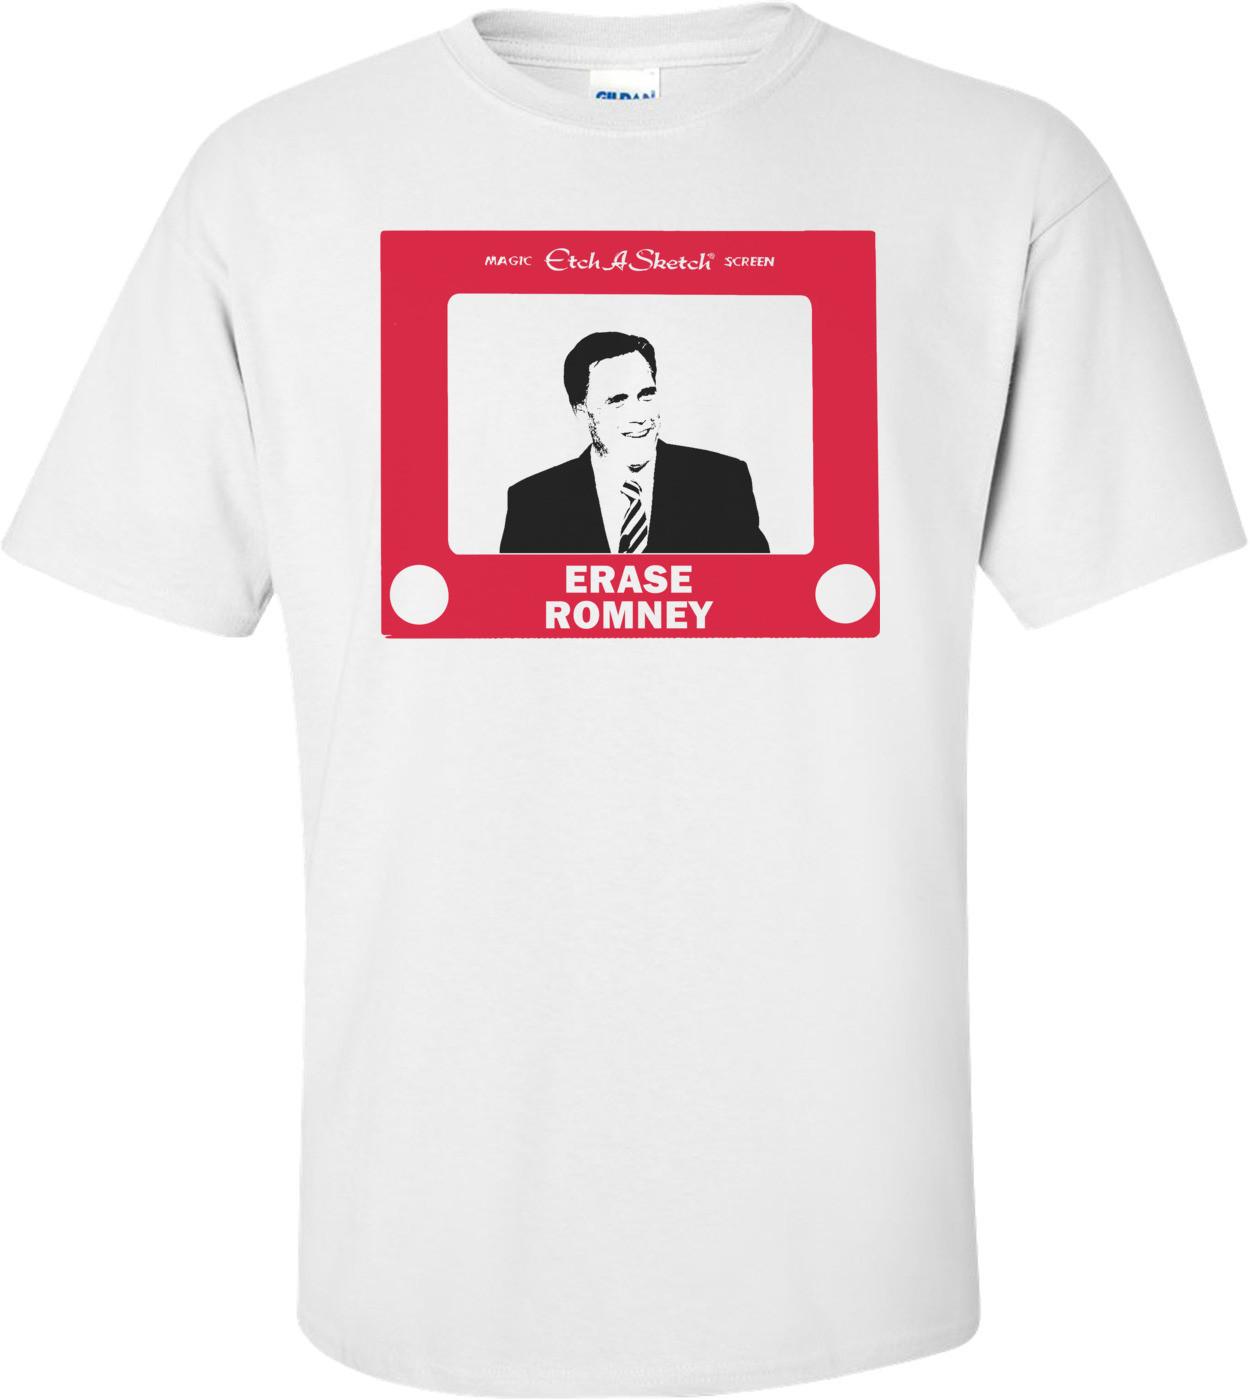 Etch A Sketch Erase Romney - Anti Mitt Romney Shirt